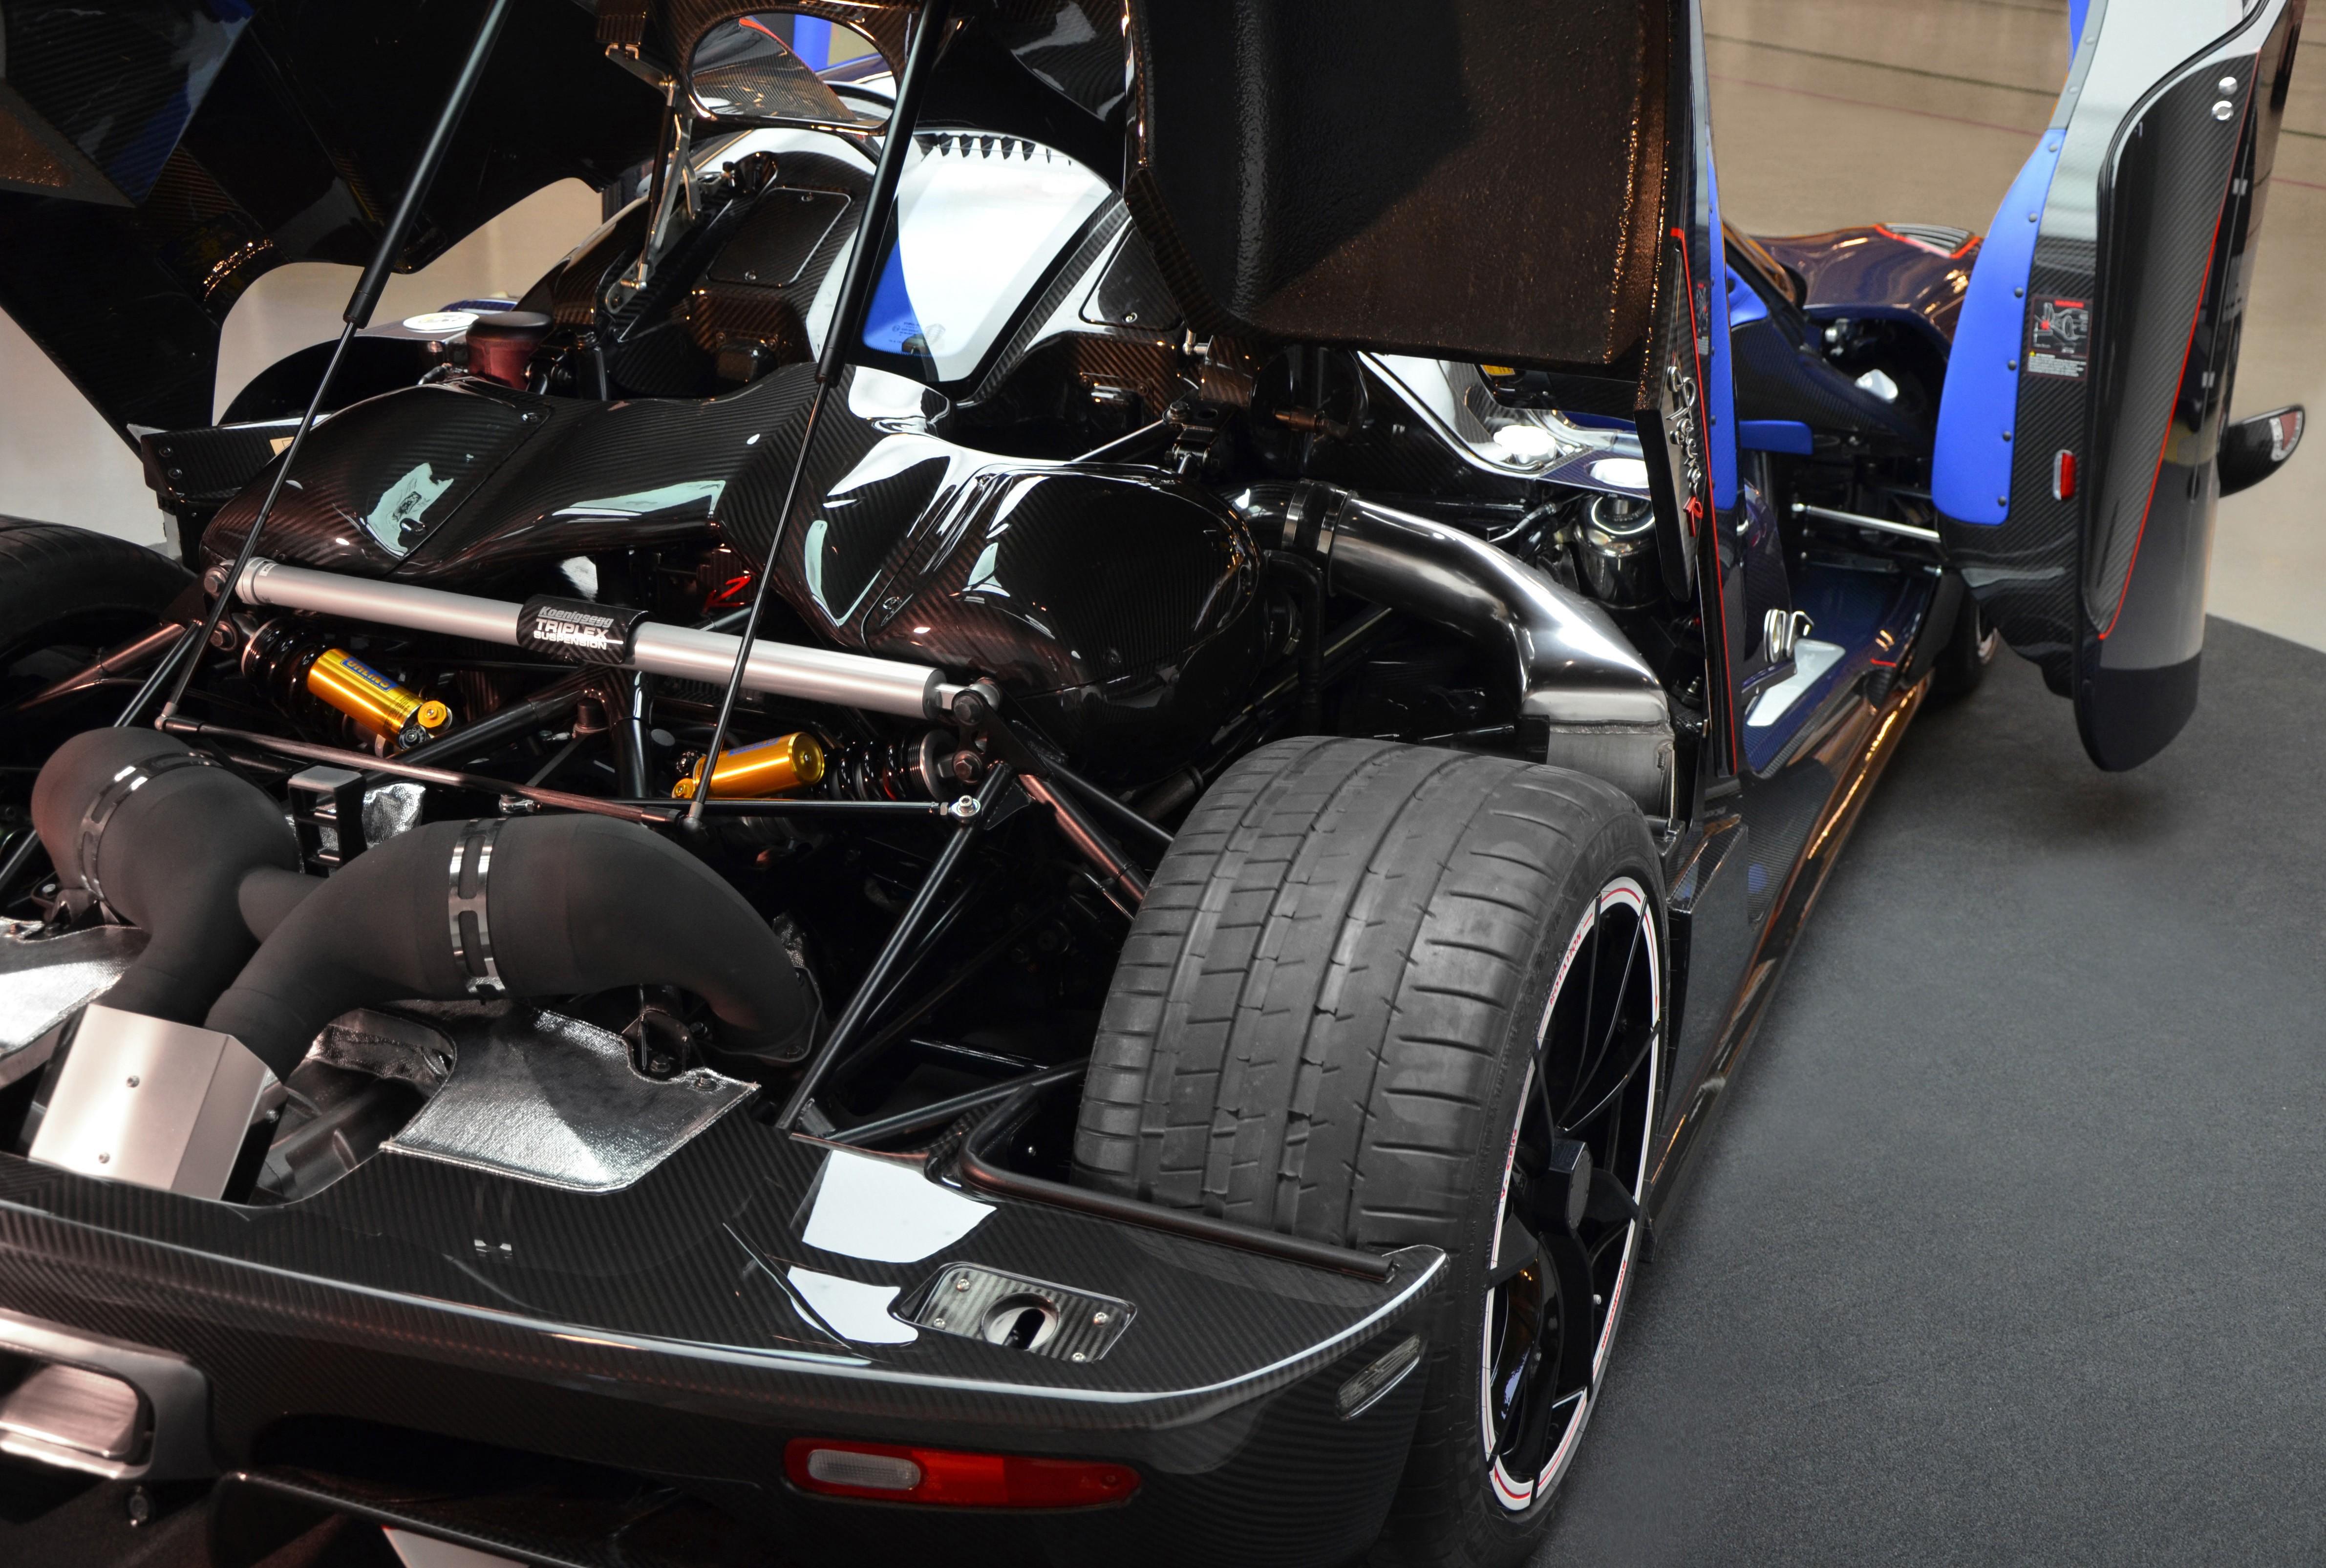 Koenigsegg Ccxr Trevita >> Koenigsegg Agera RS Confirmed to Debut at Geneva Motor Show - autoevolution